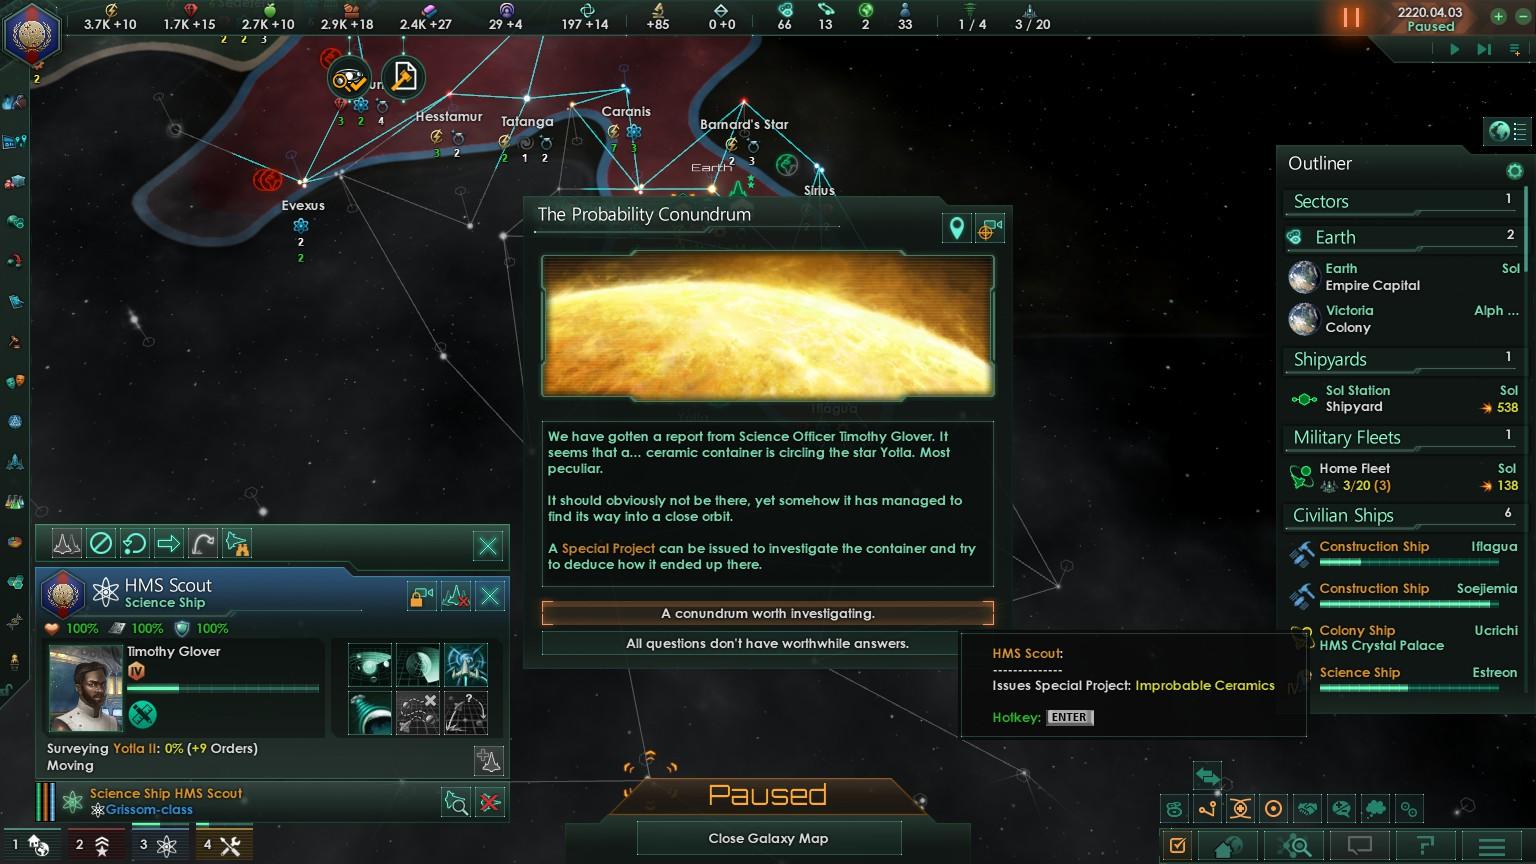 Stellaris, PDox Space Game - A Taste of Rome | Page 717